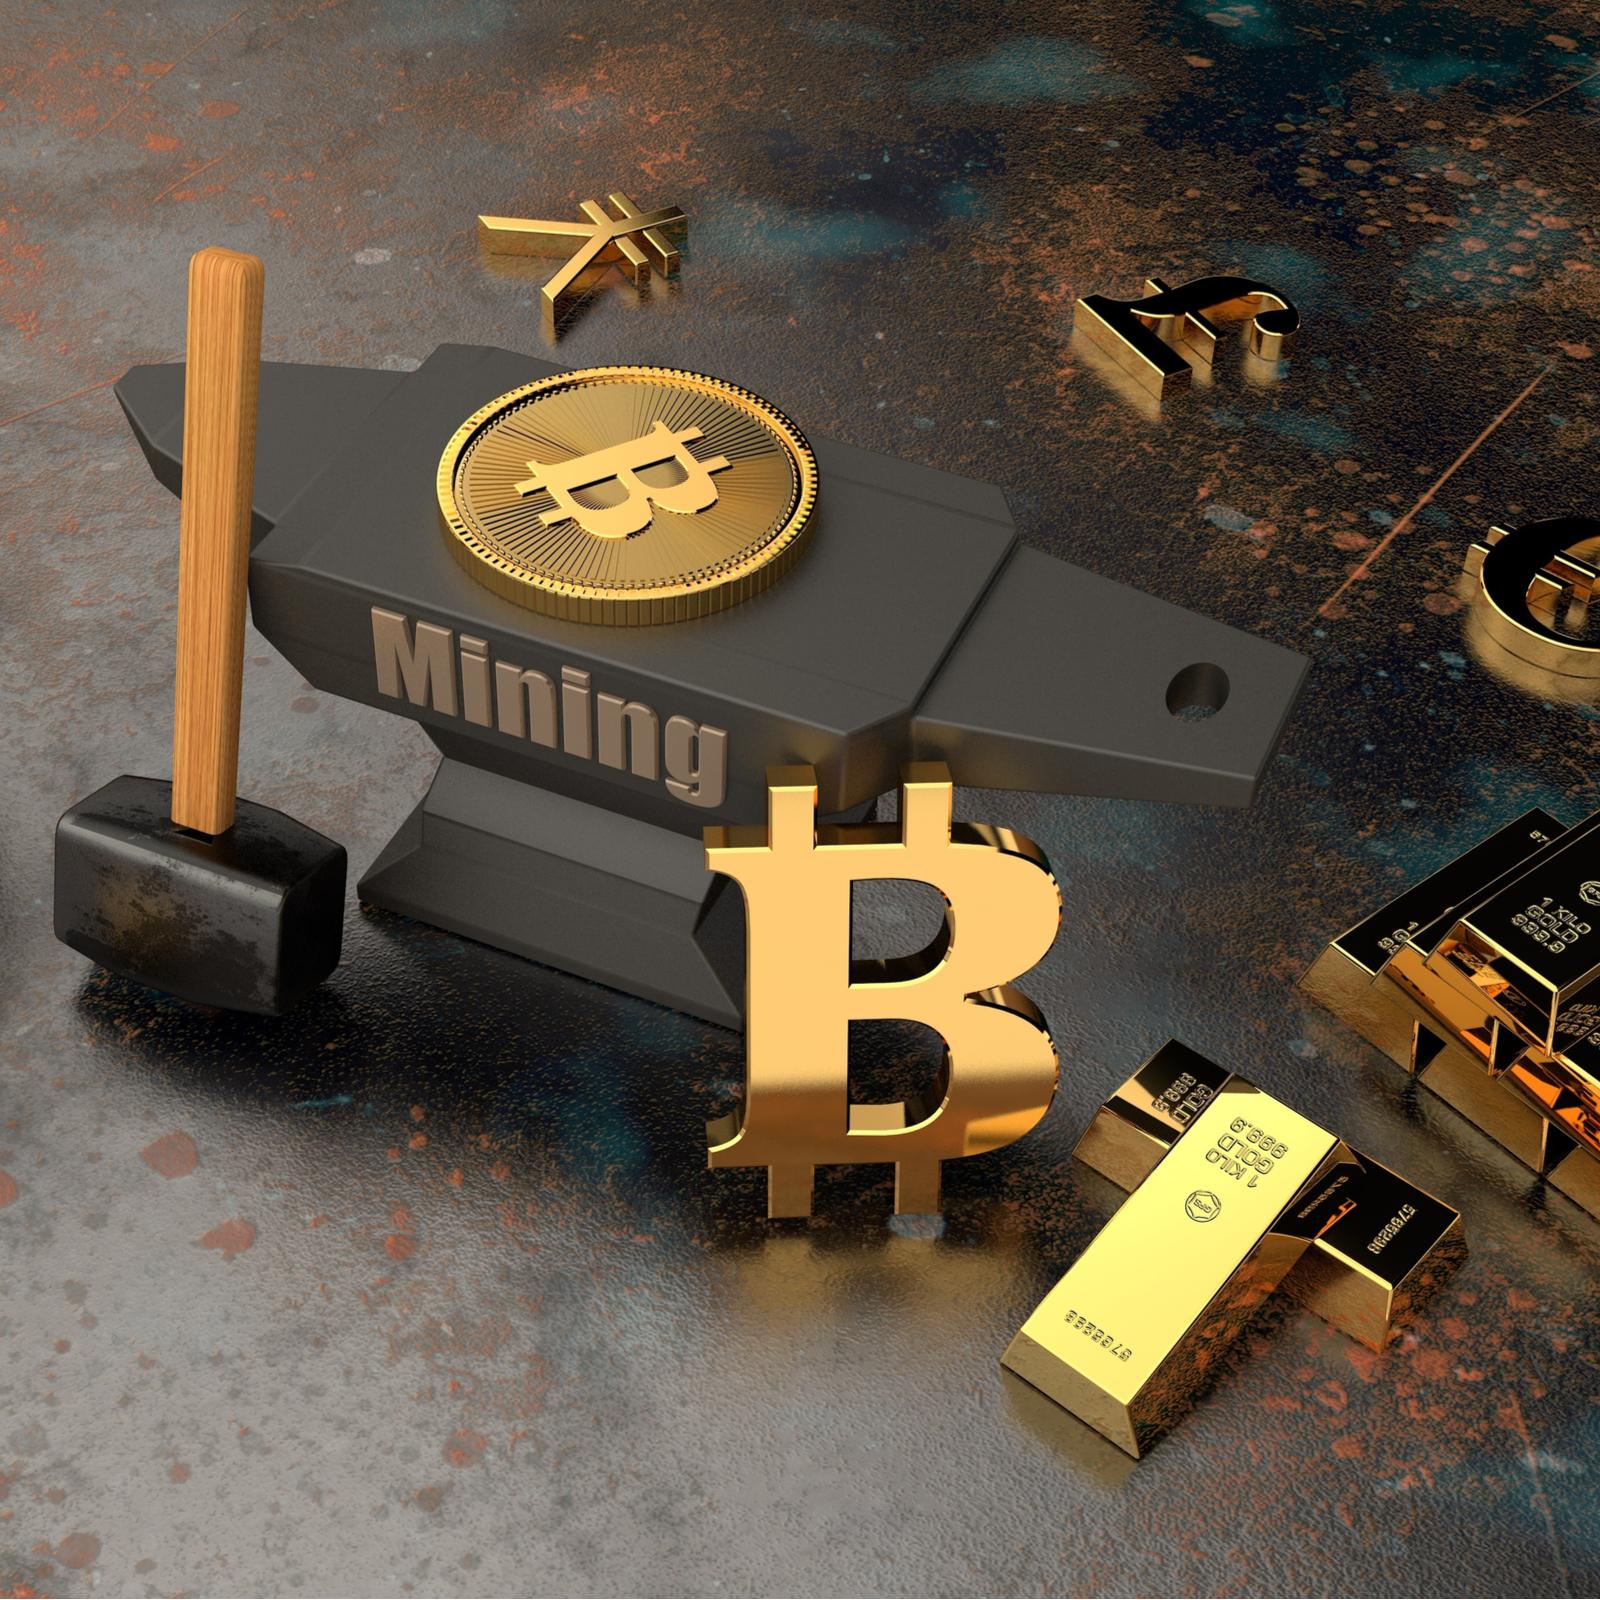 Voorhees Questions Crypto VC 'Smart Money', Sechet Explains Pacia's 'Miners Don't Vote' Declaration